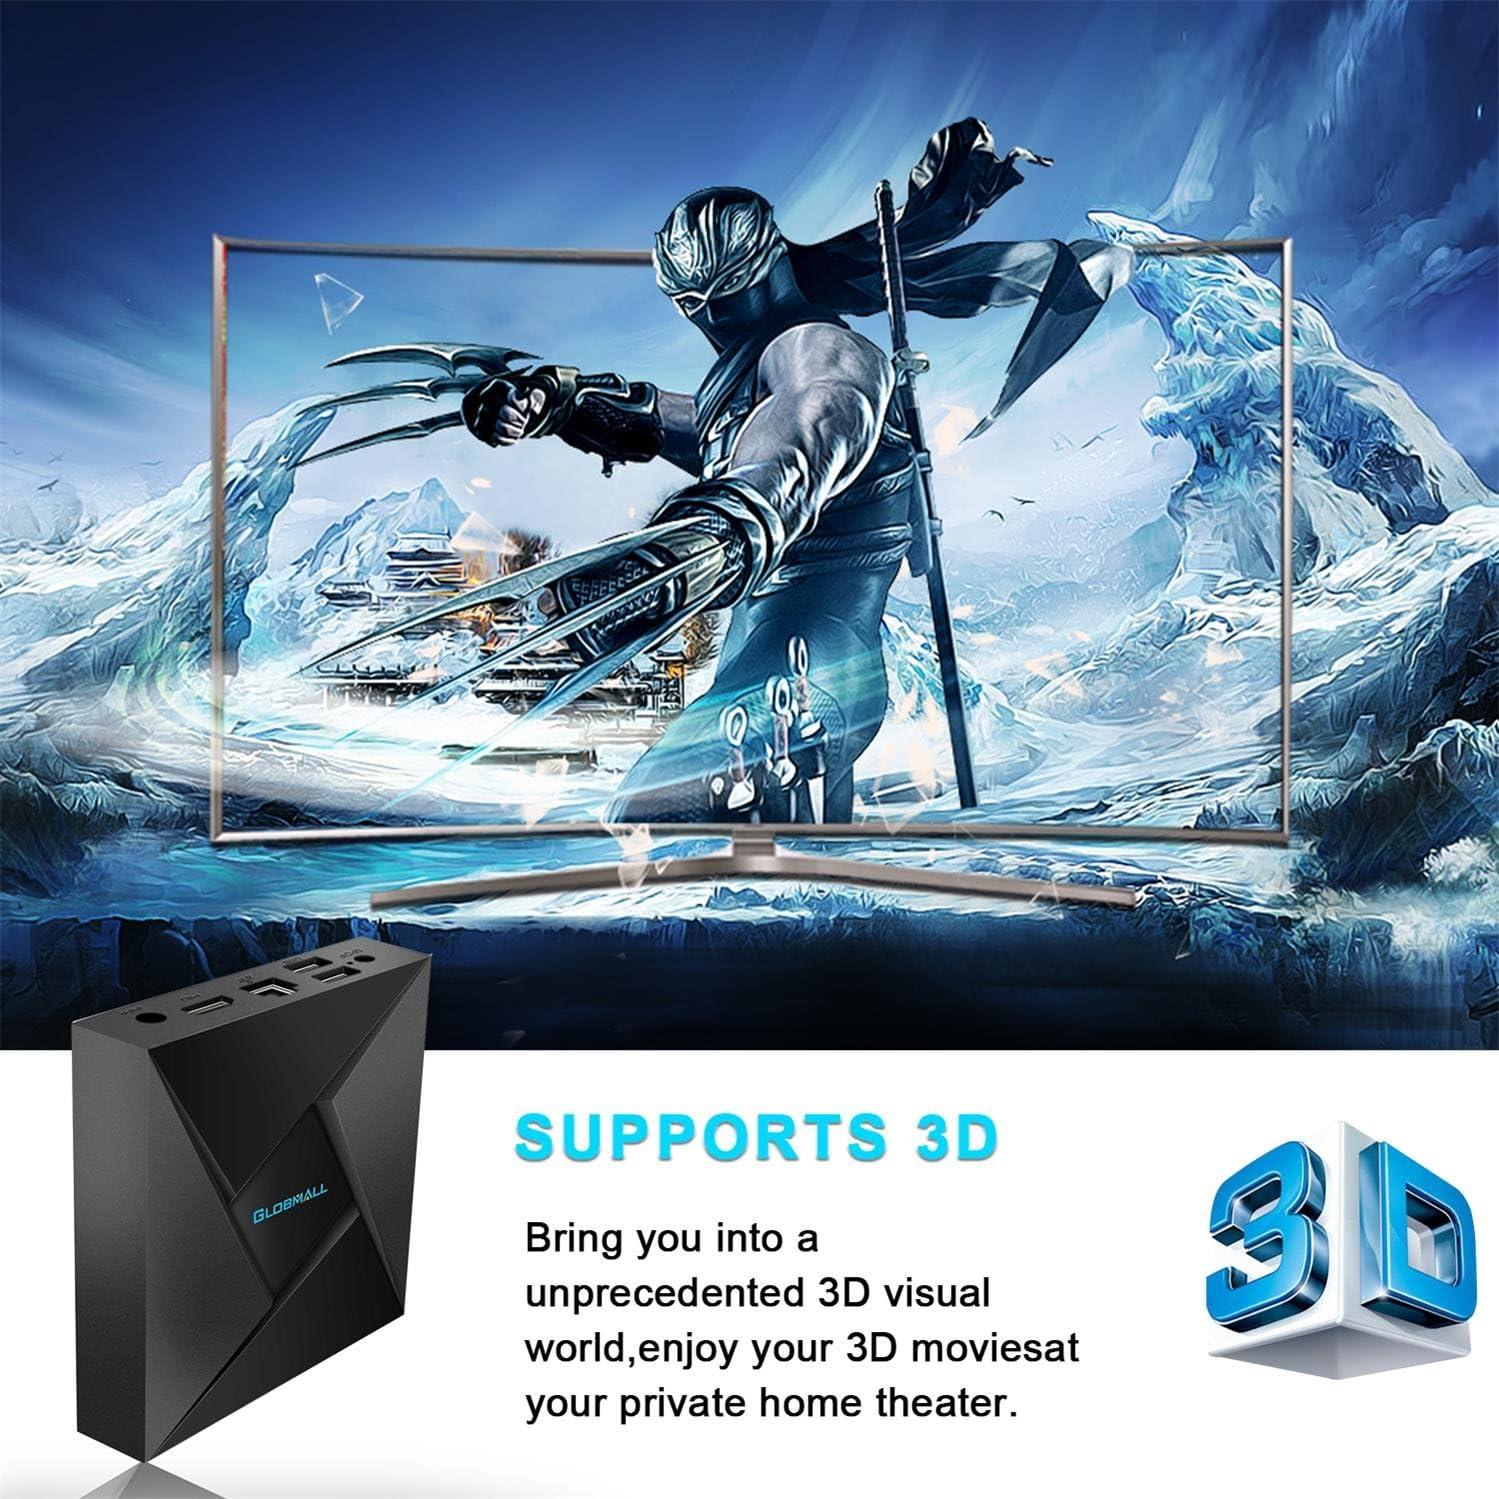 globmall 4 K Android TV Box 7.1, 2018 modelo x4 Smart TV Box 2 G RAM 16 G ROM Amlogic Quad Core ARM Cortex A53 @ 2GHz con HDMI 2.0 a Bluetooth V4.0: Amazon.es: Electrónica